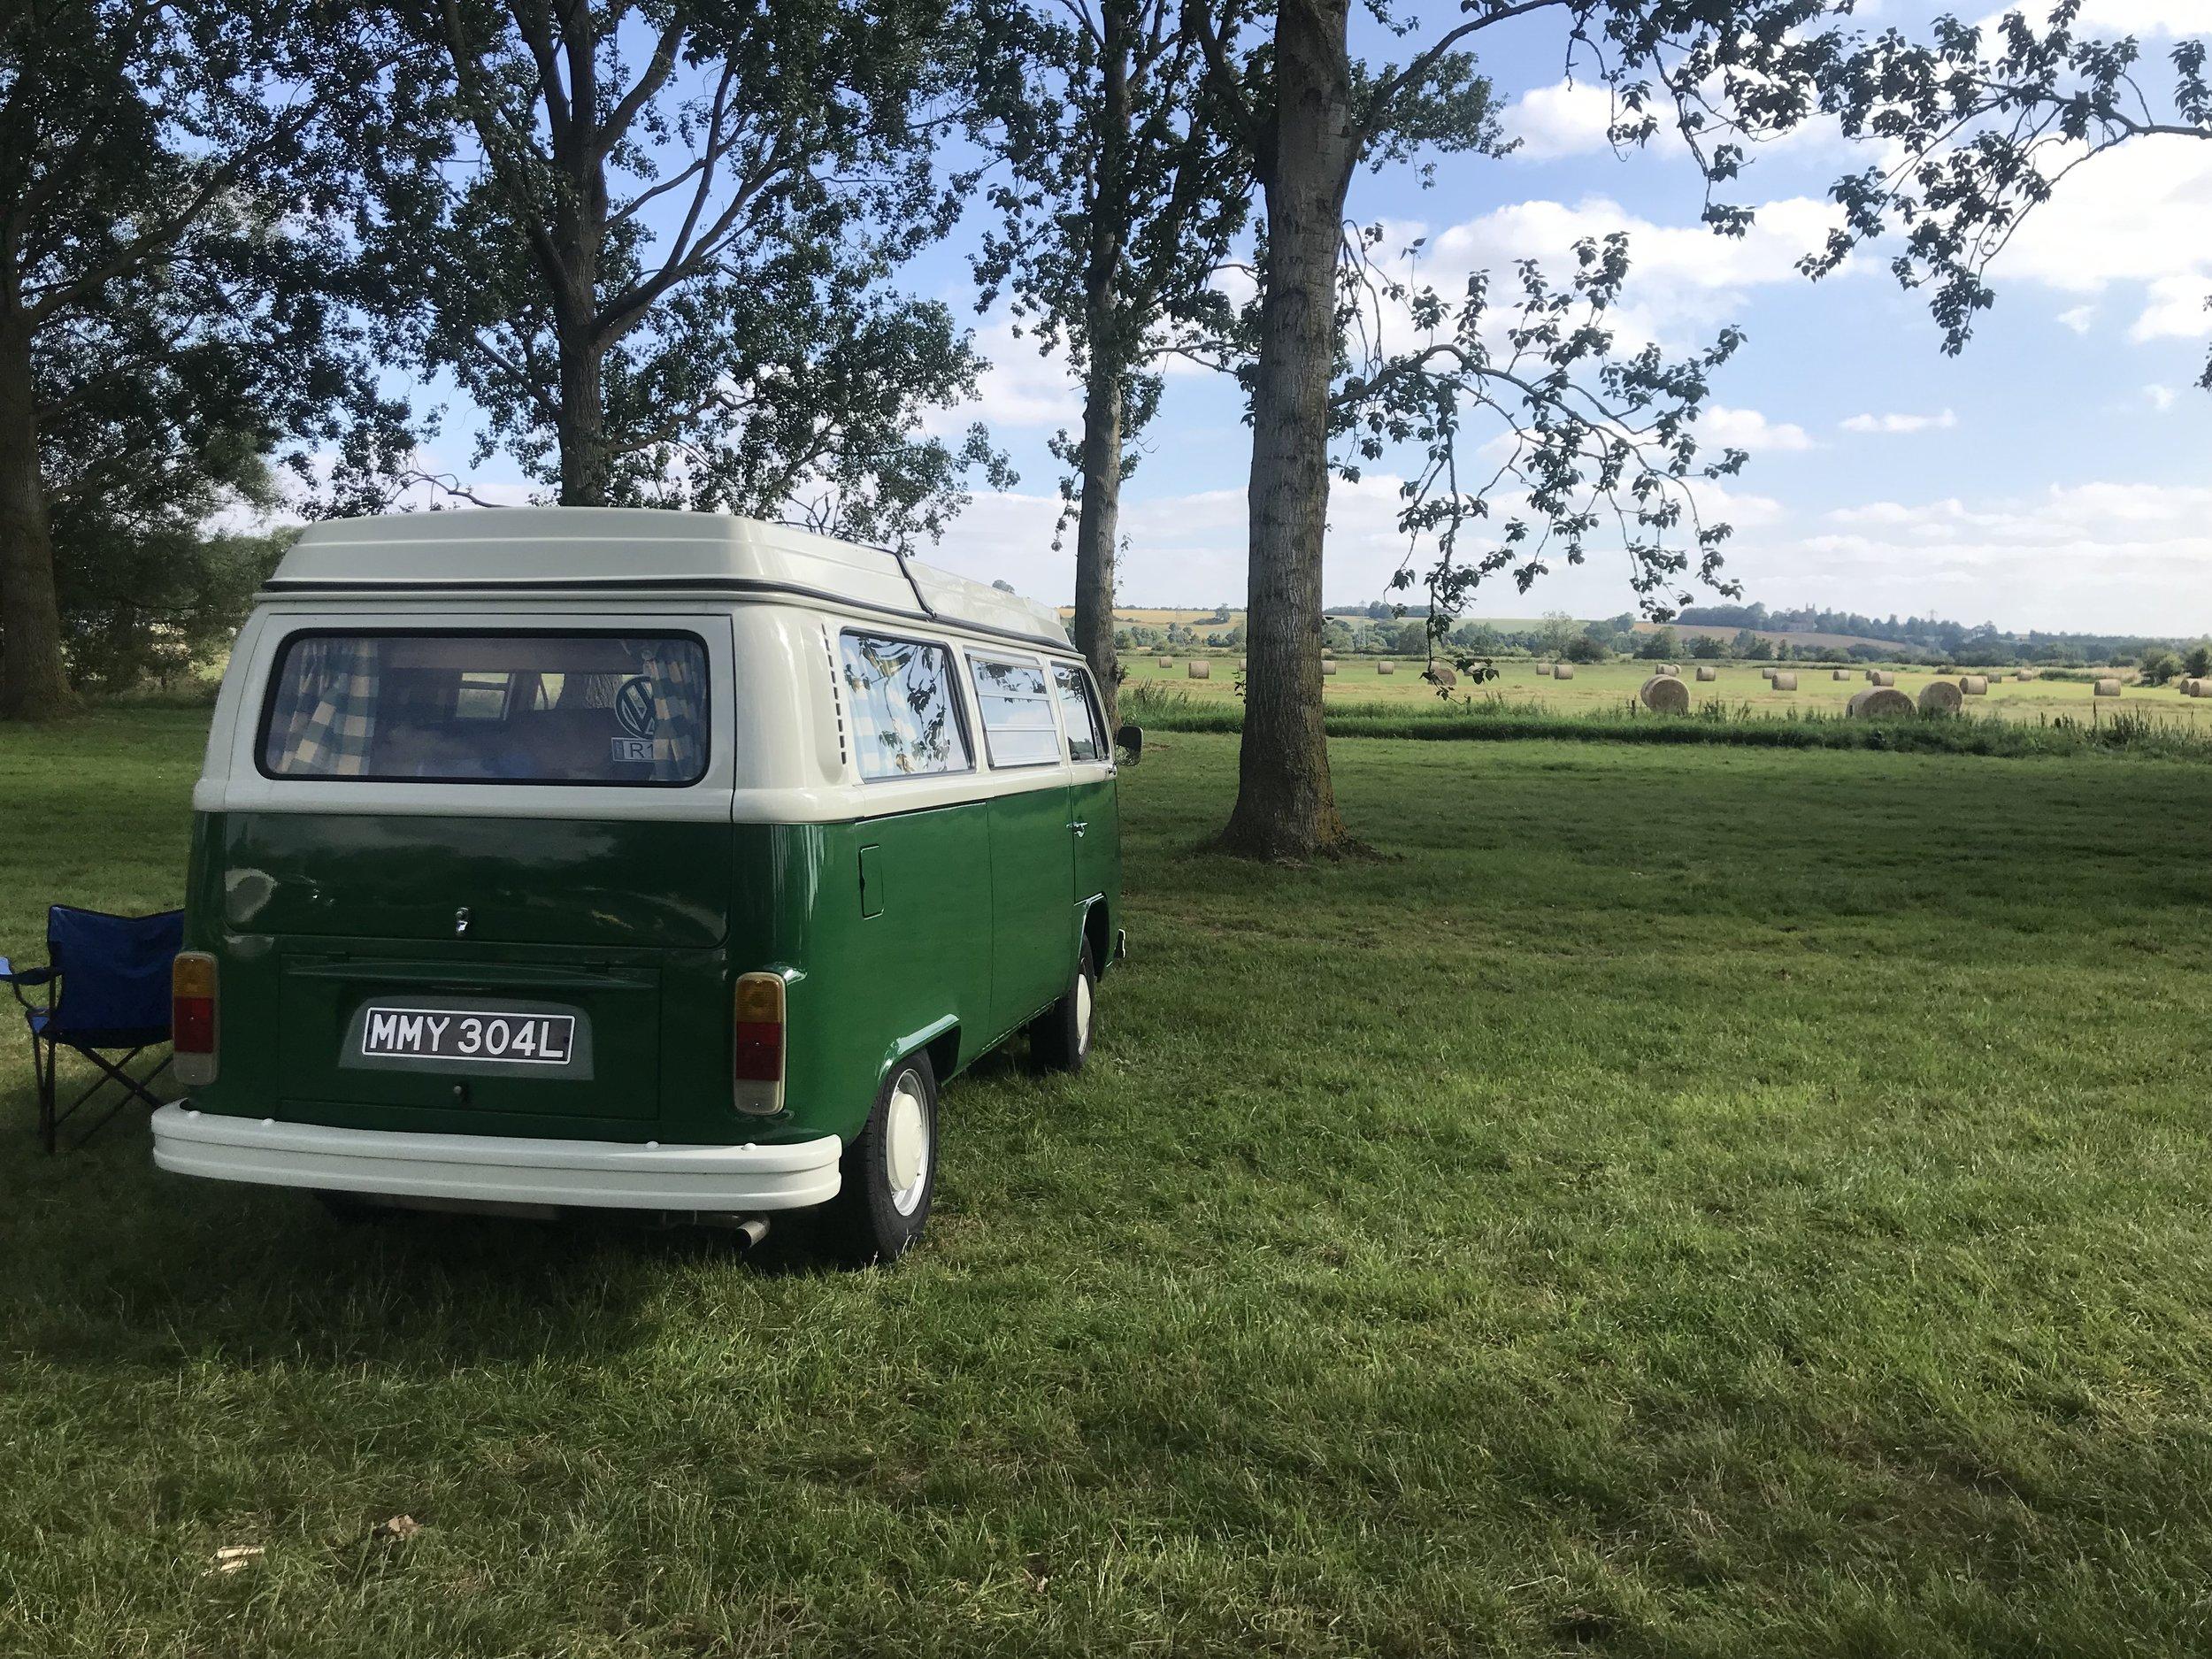 camper_VW_camping_white_mills_marina_river_nene_earls_barton